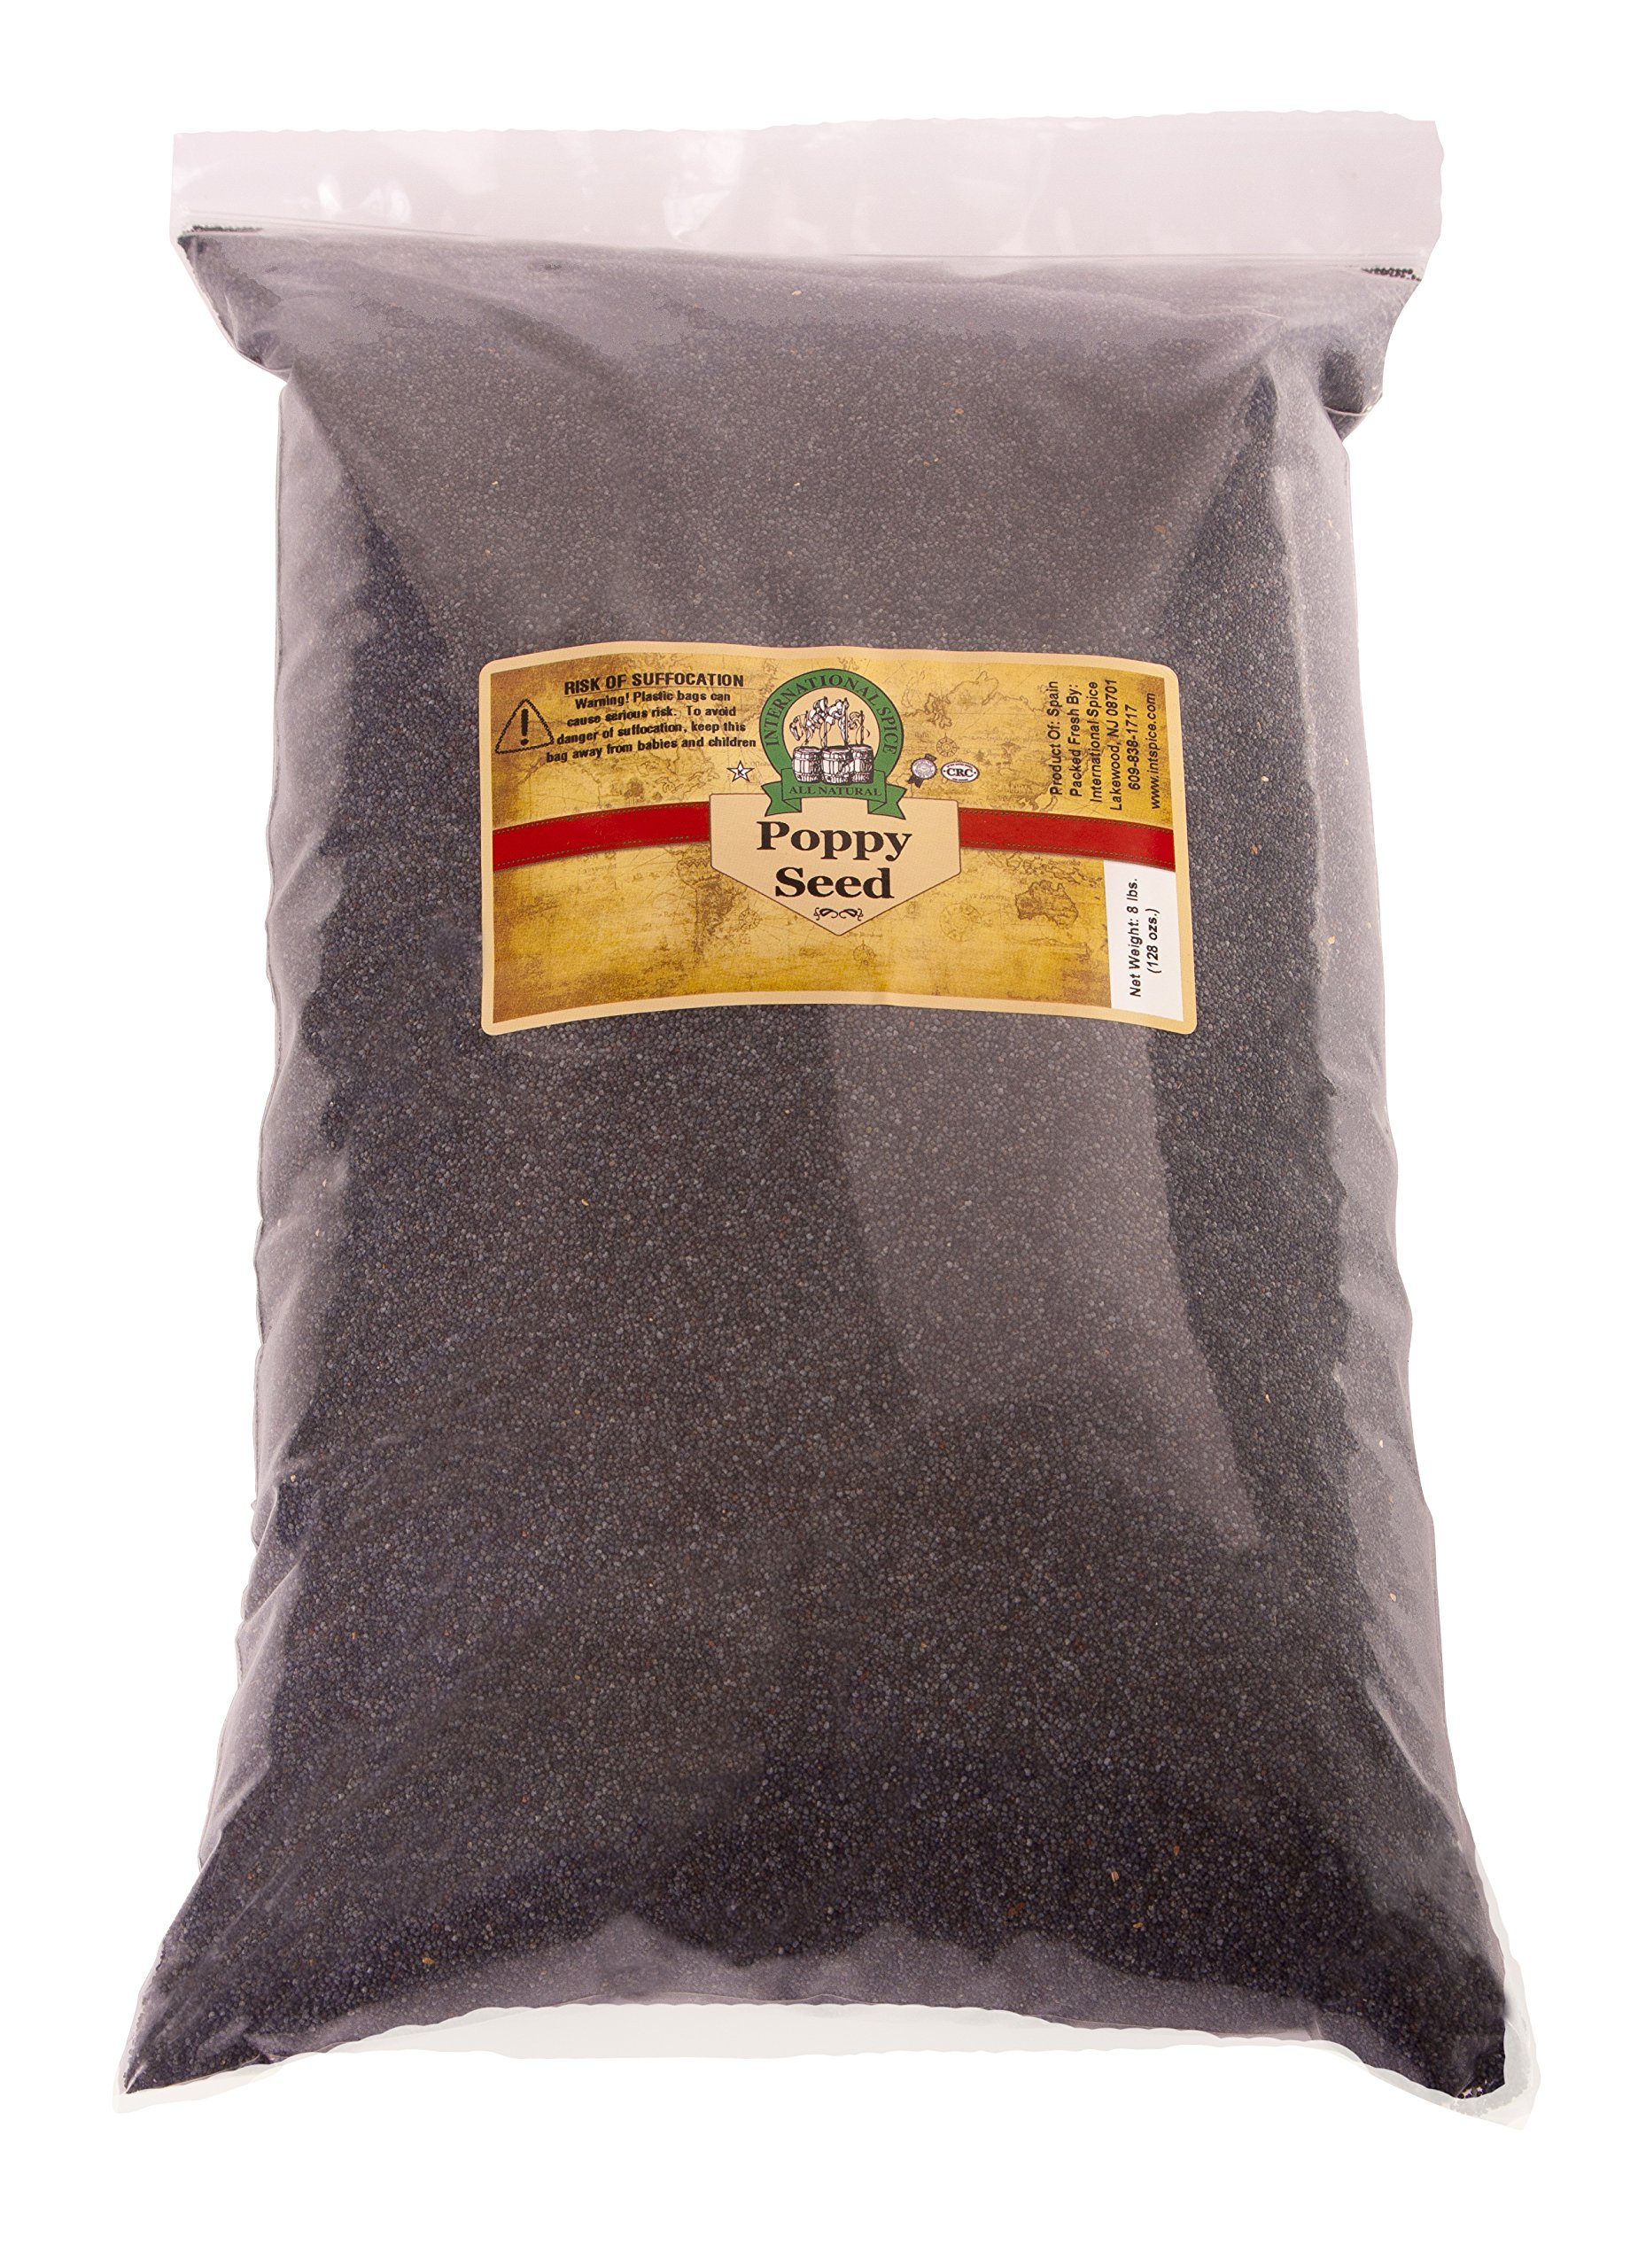 INTERNATIONAL SPICE- POPPY SEEDS - 8 Pounds, (Variety: Blue; Grade: A-1) (8 LBS)